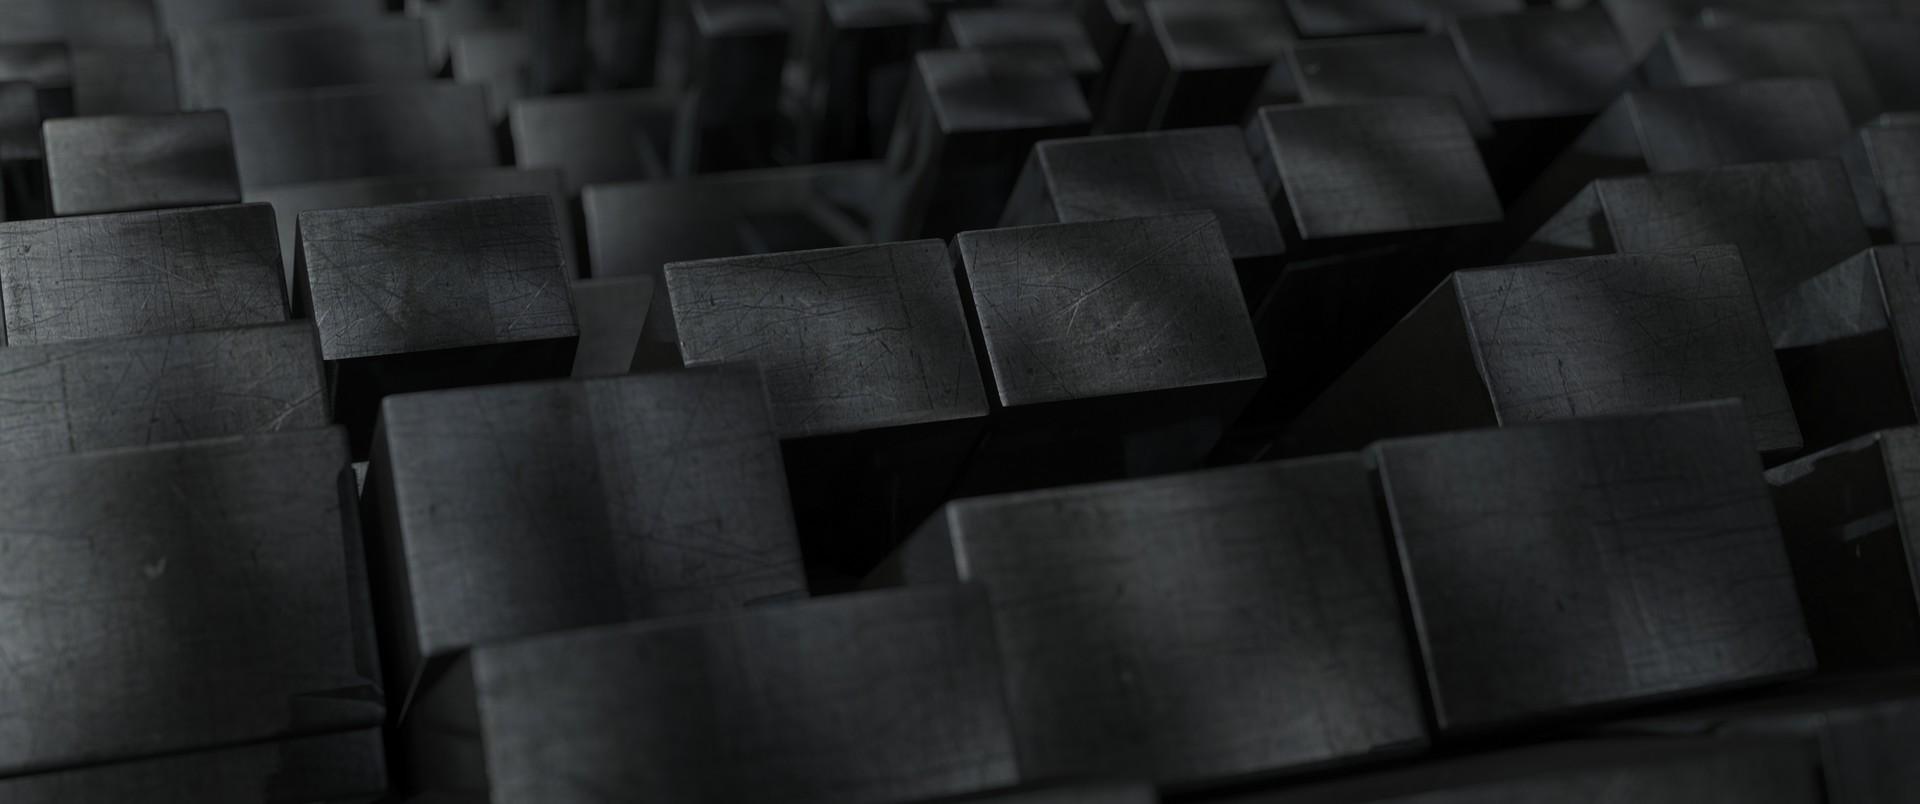 Kresimir jelusic robob3ar 494 abstract box 20 6k